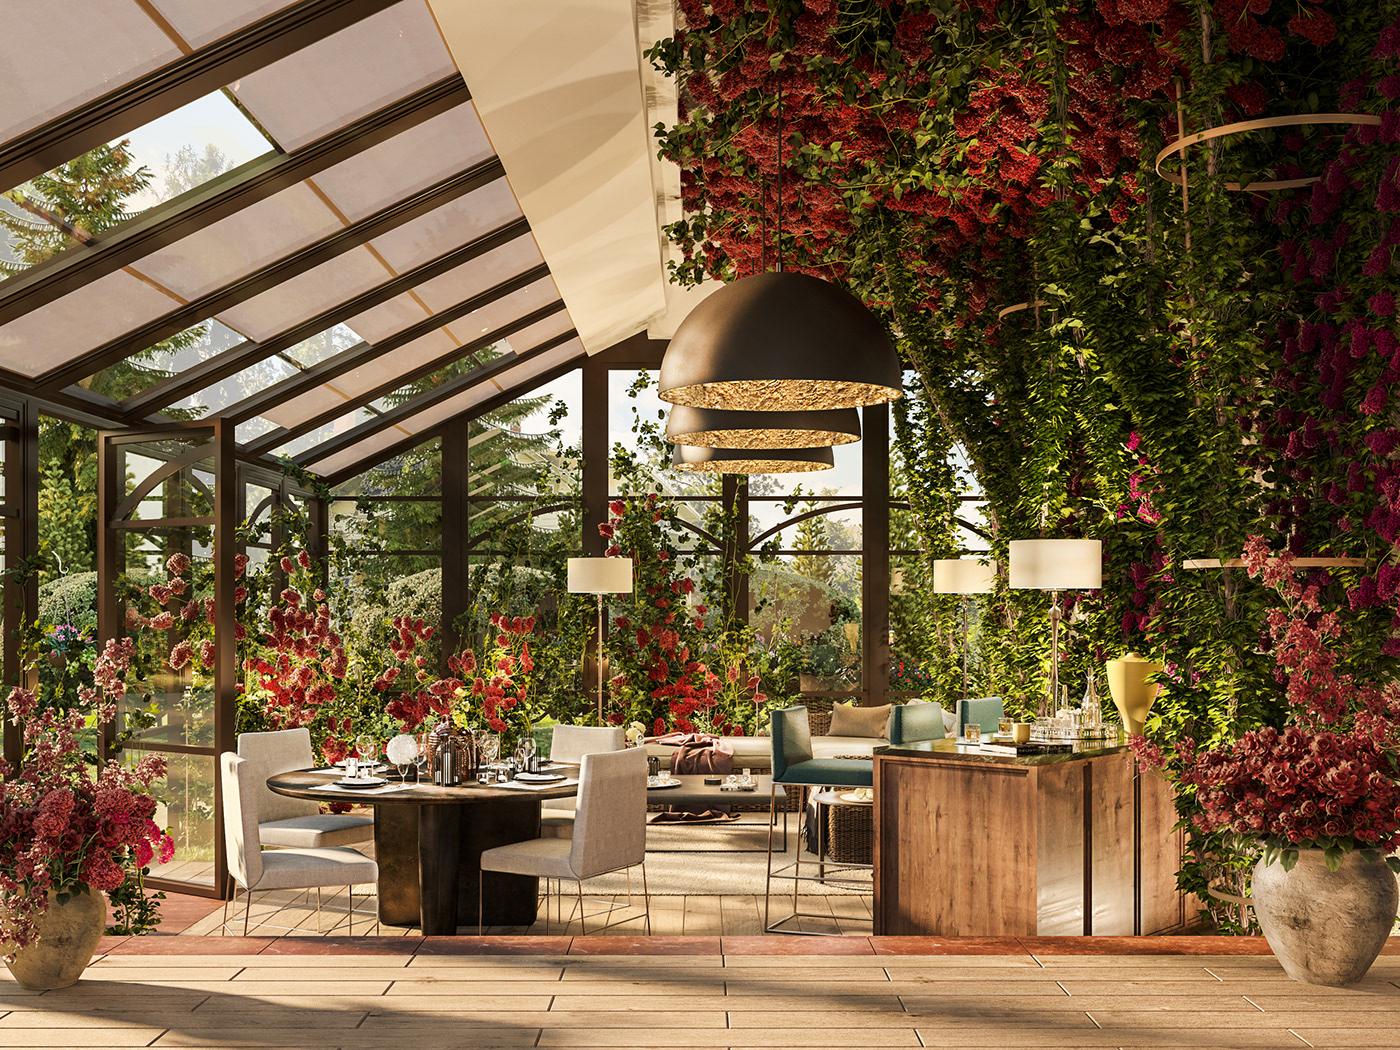 Interior design architecture terrace porch vegetation Flowers Landscape furniture light